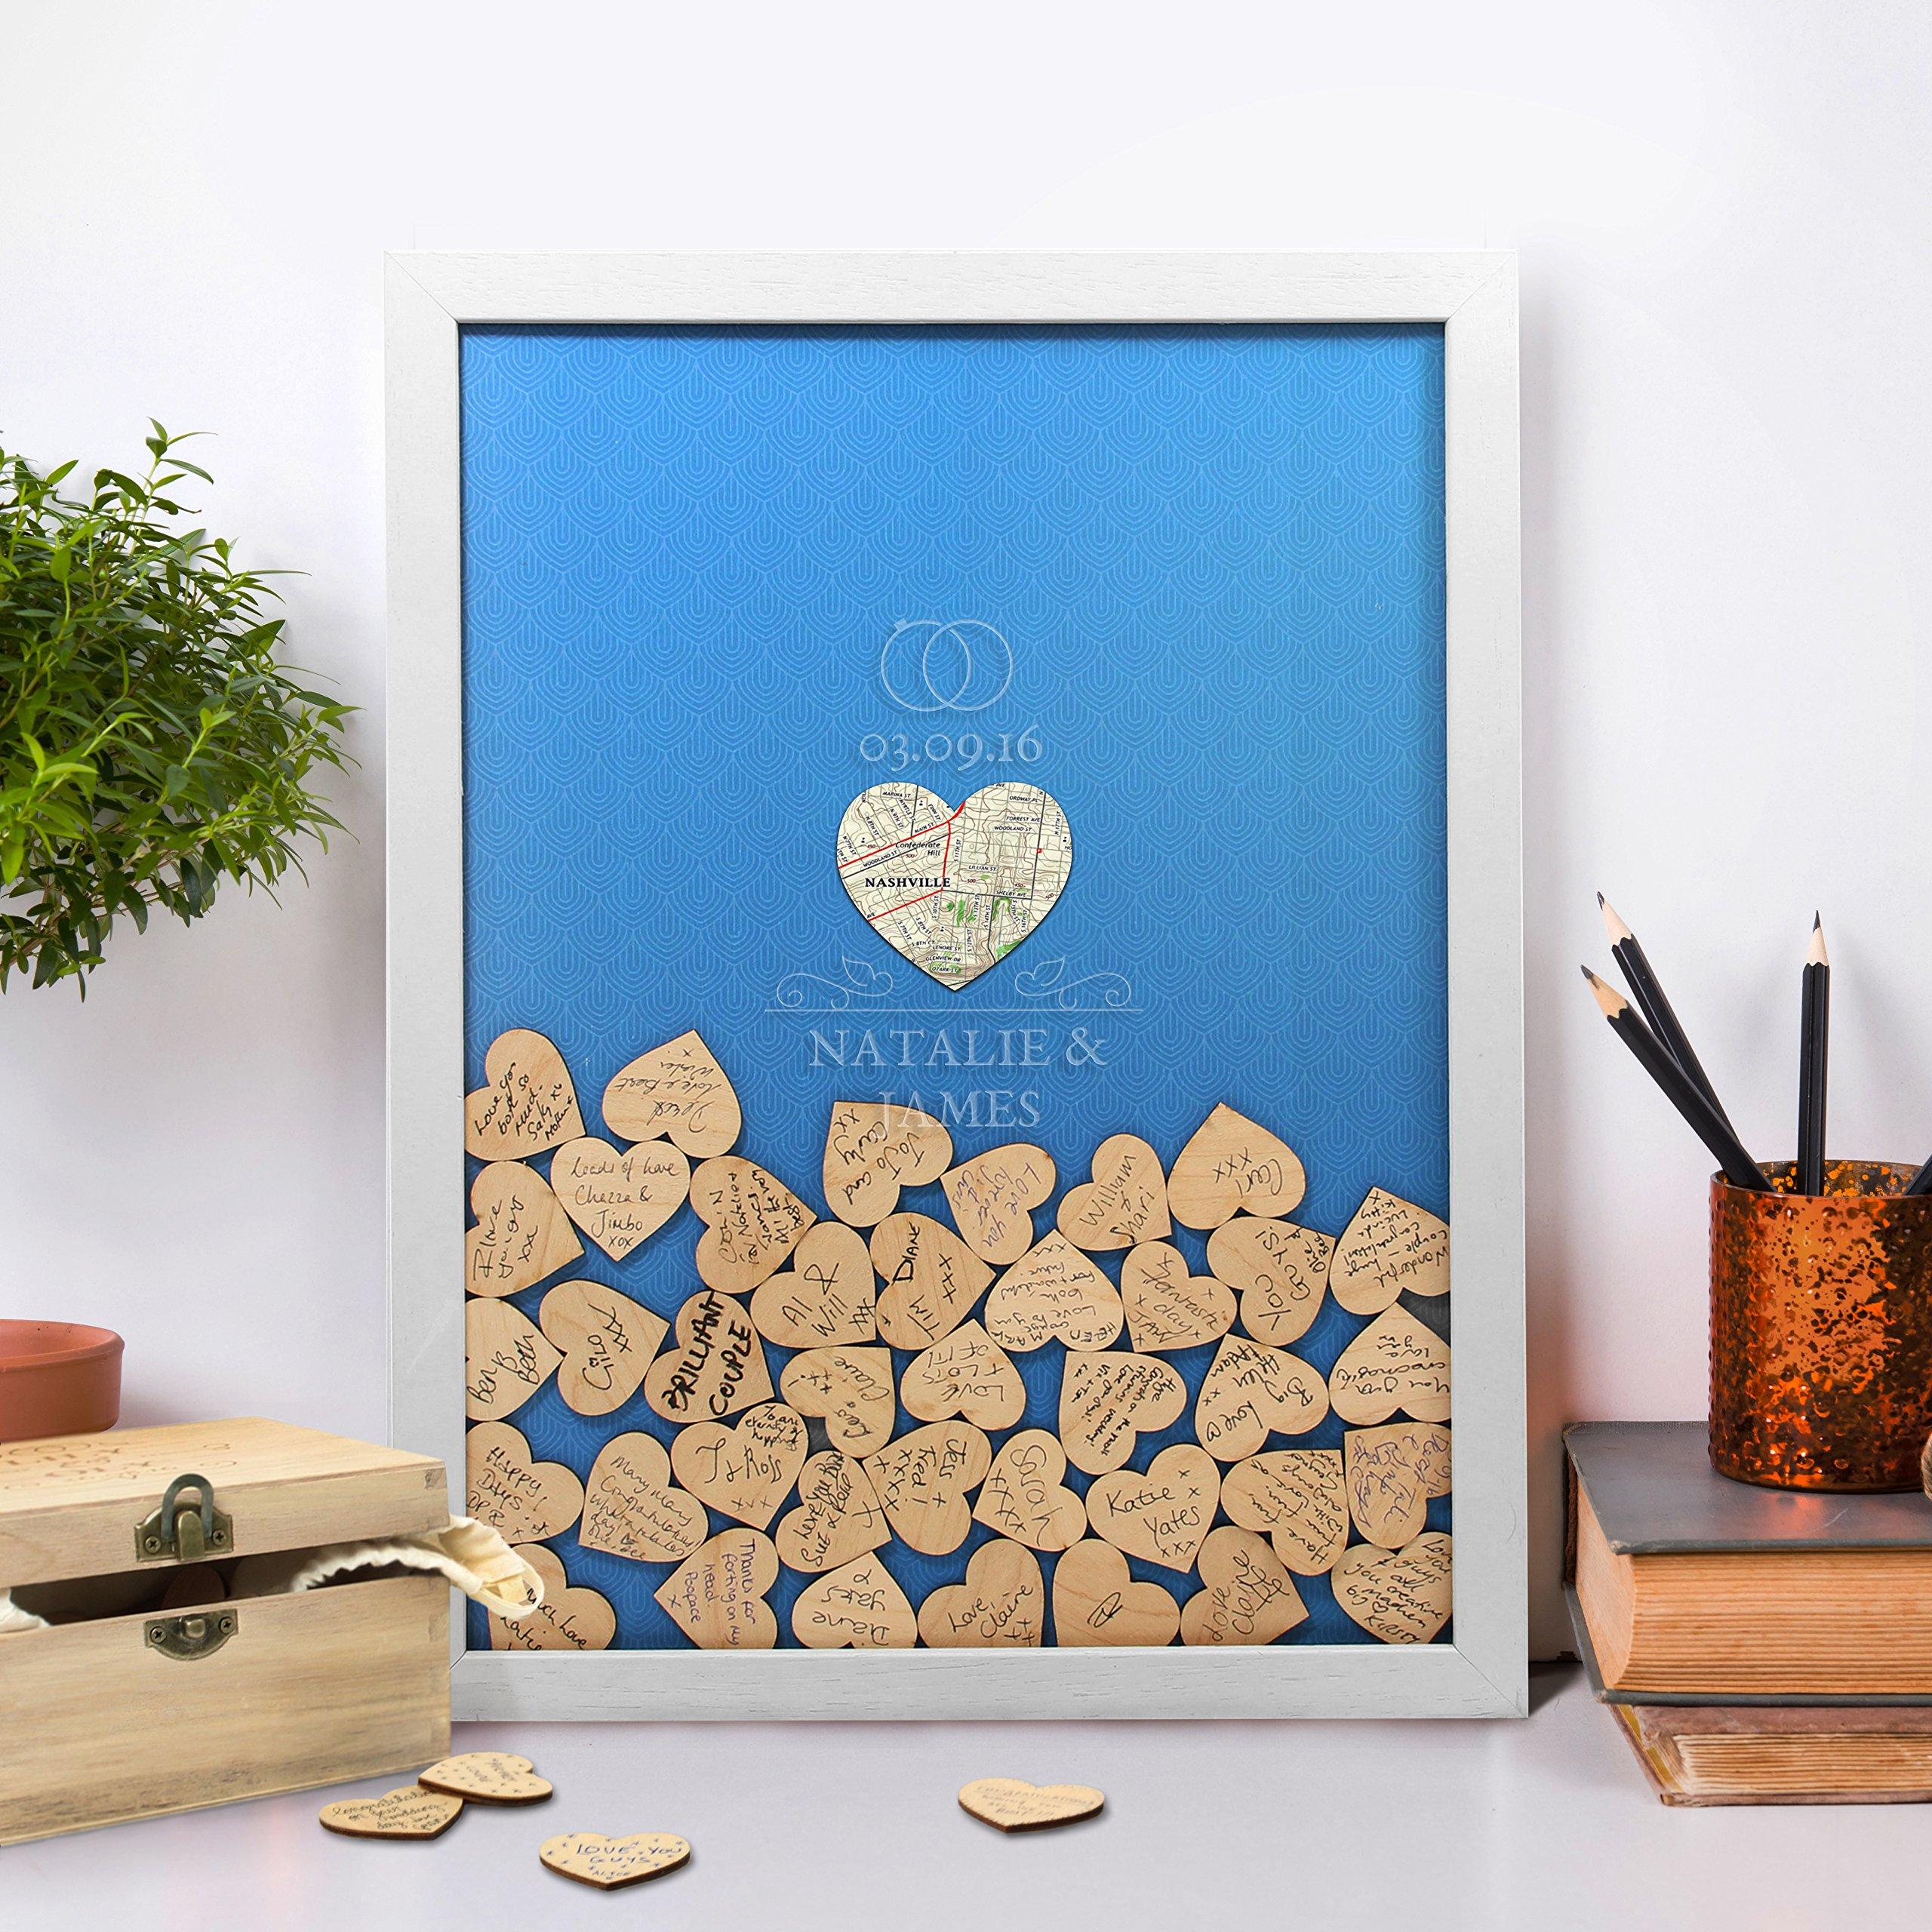 Wedding Drop Box - an alternative Wedding Guest Book (100 tokens, Royal Blue) by Butler and Hill